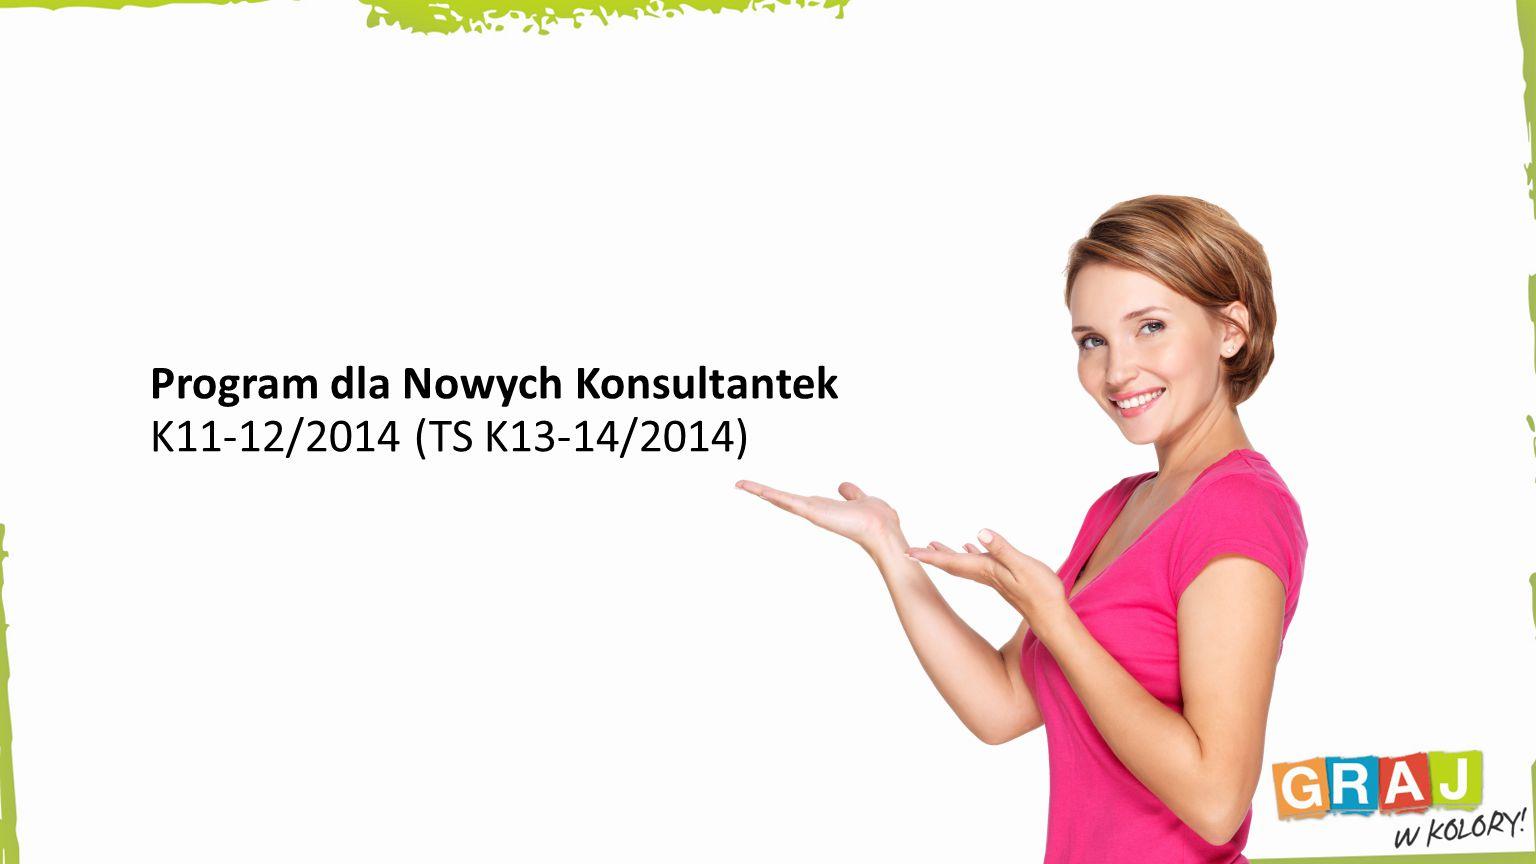 Program dla Nowych Konsultantek